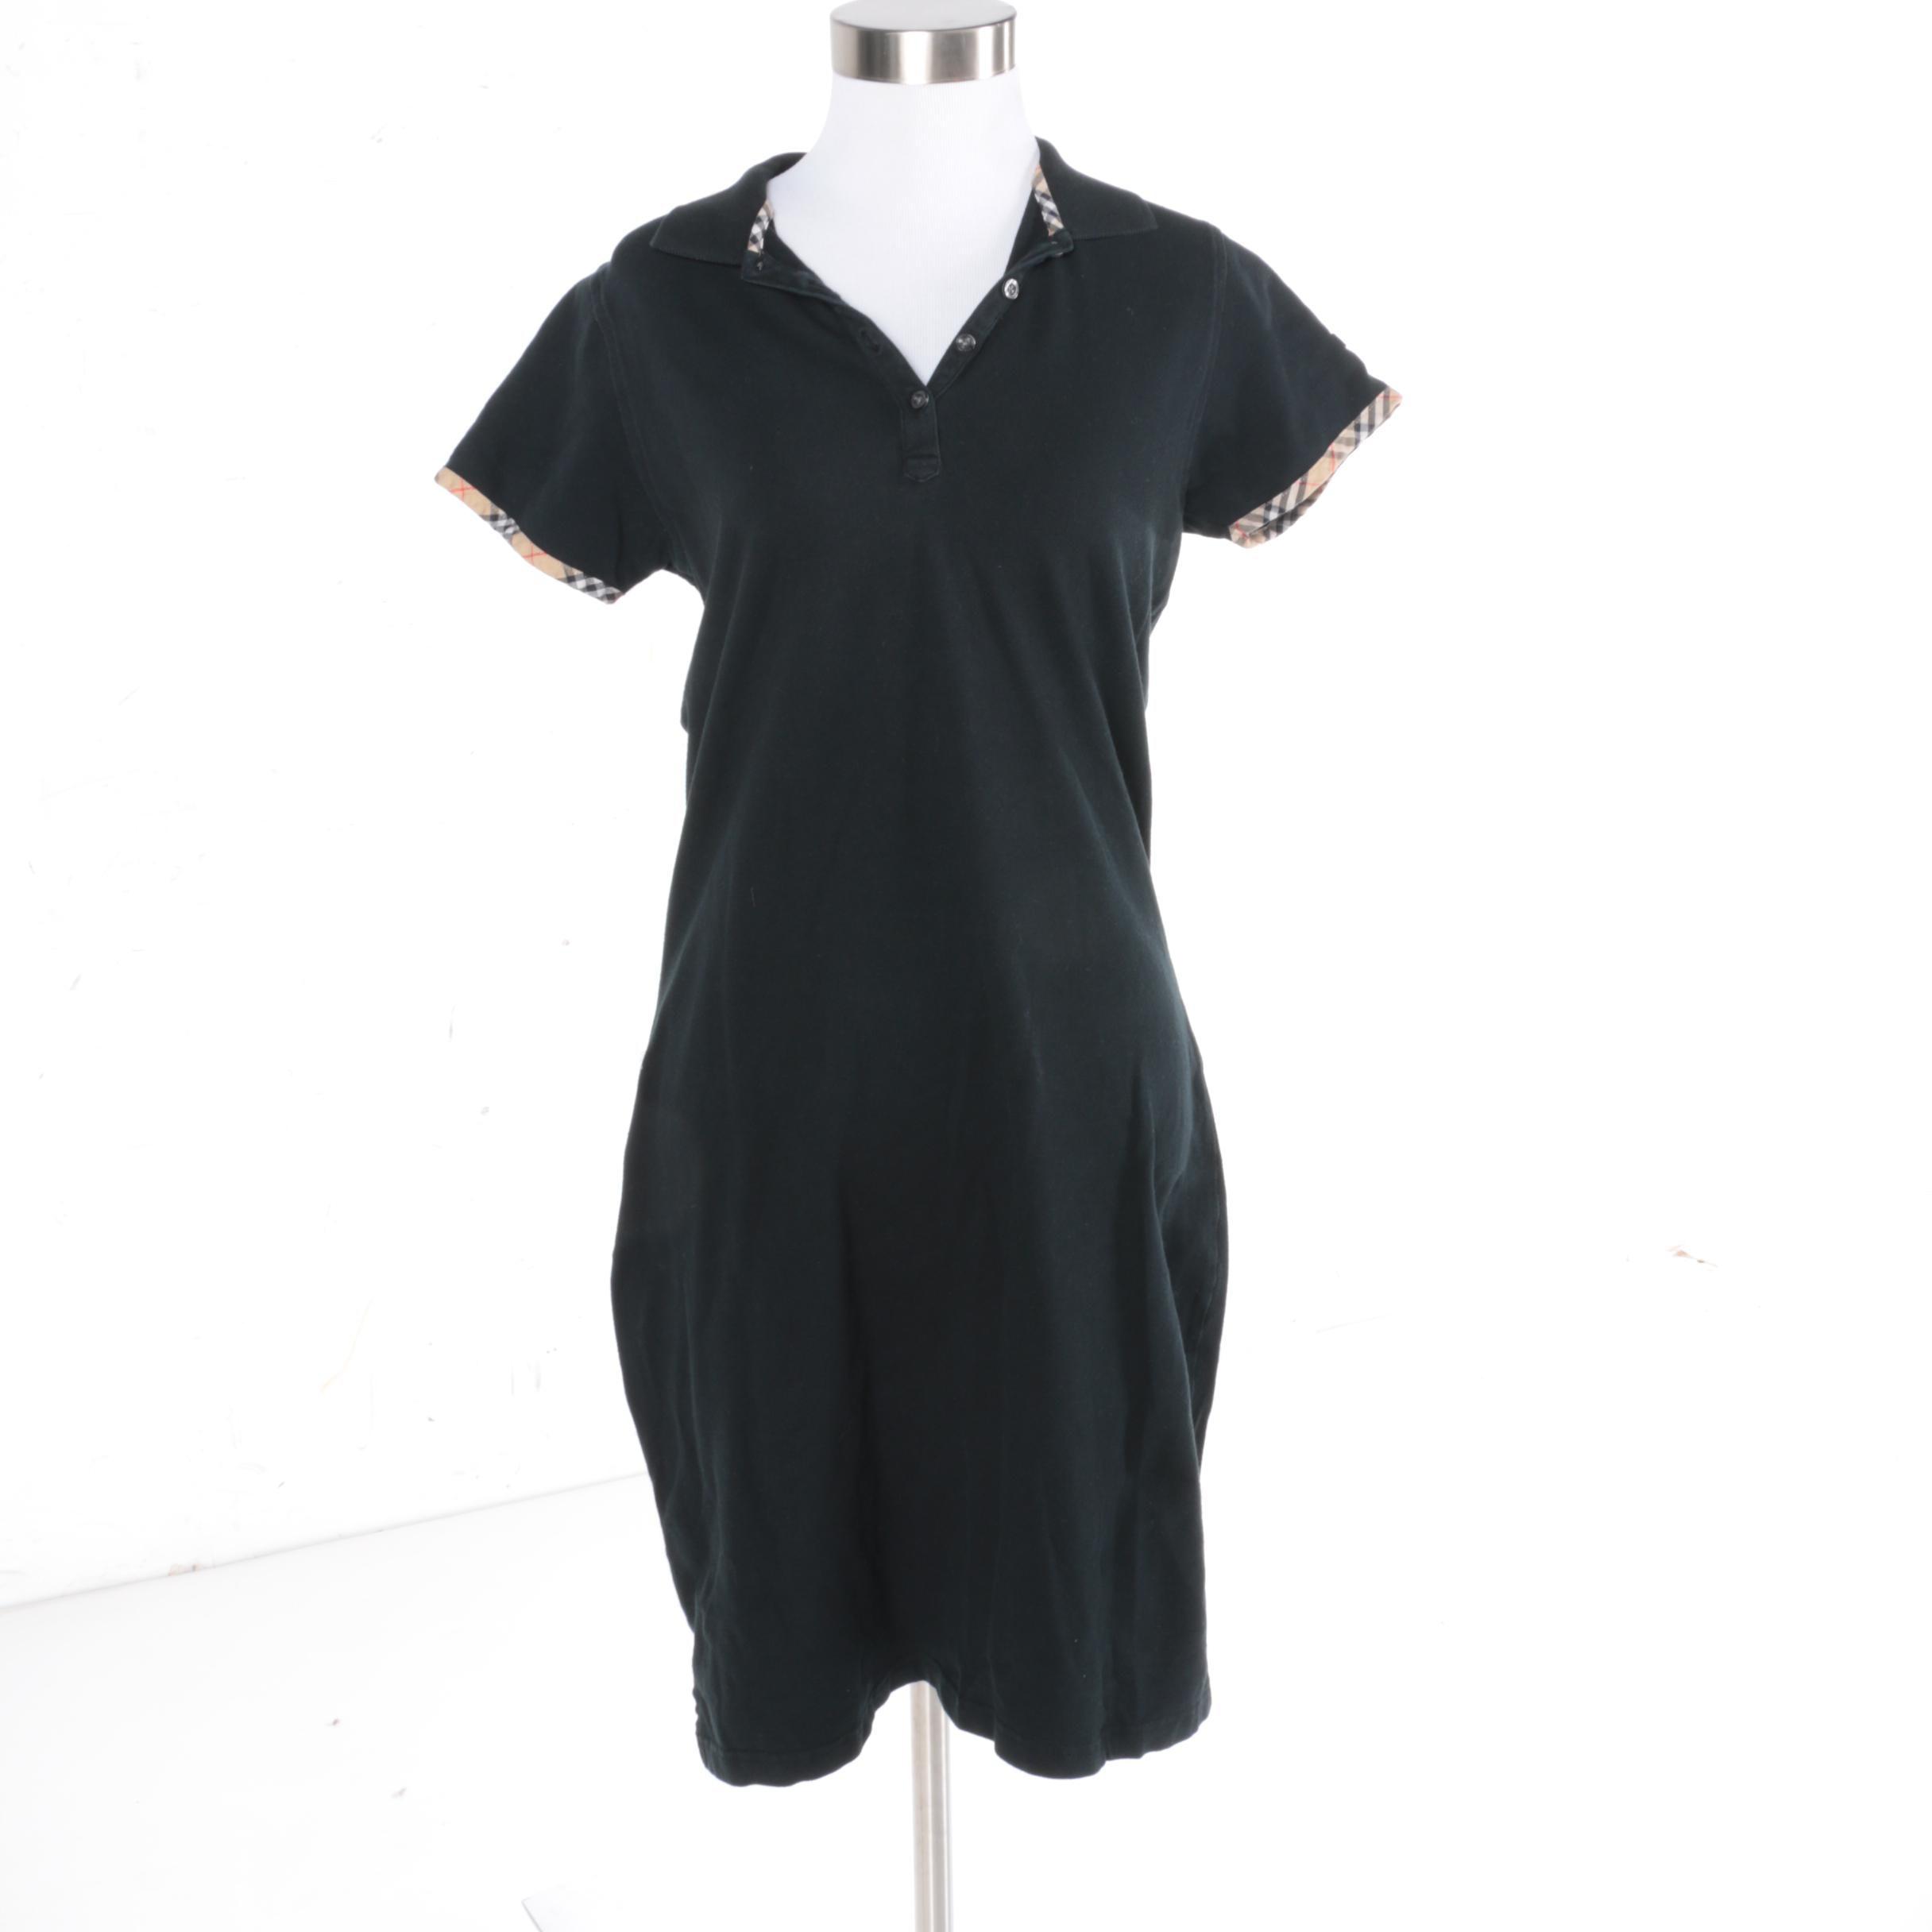 Burberry Golf Navy Polo Dress